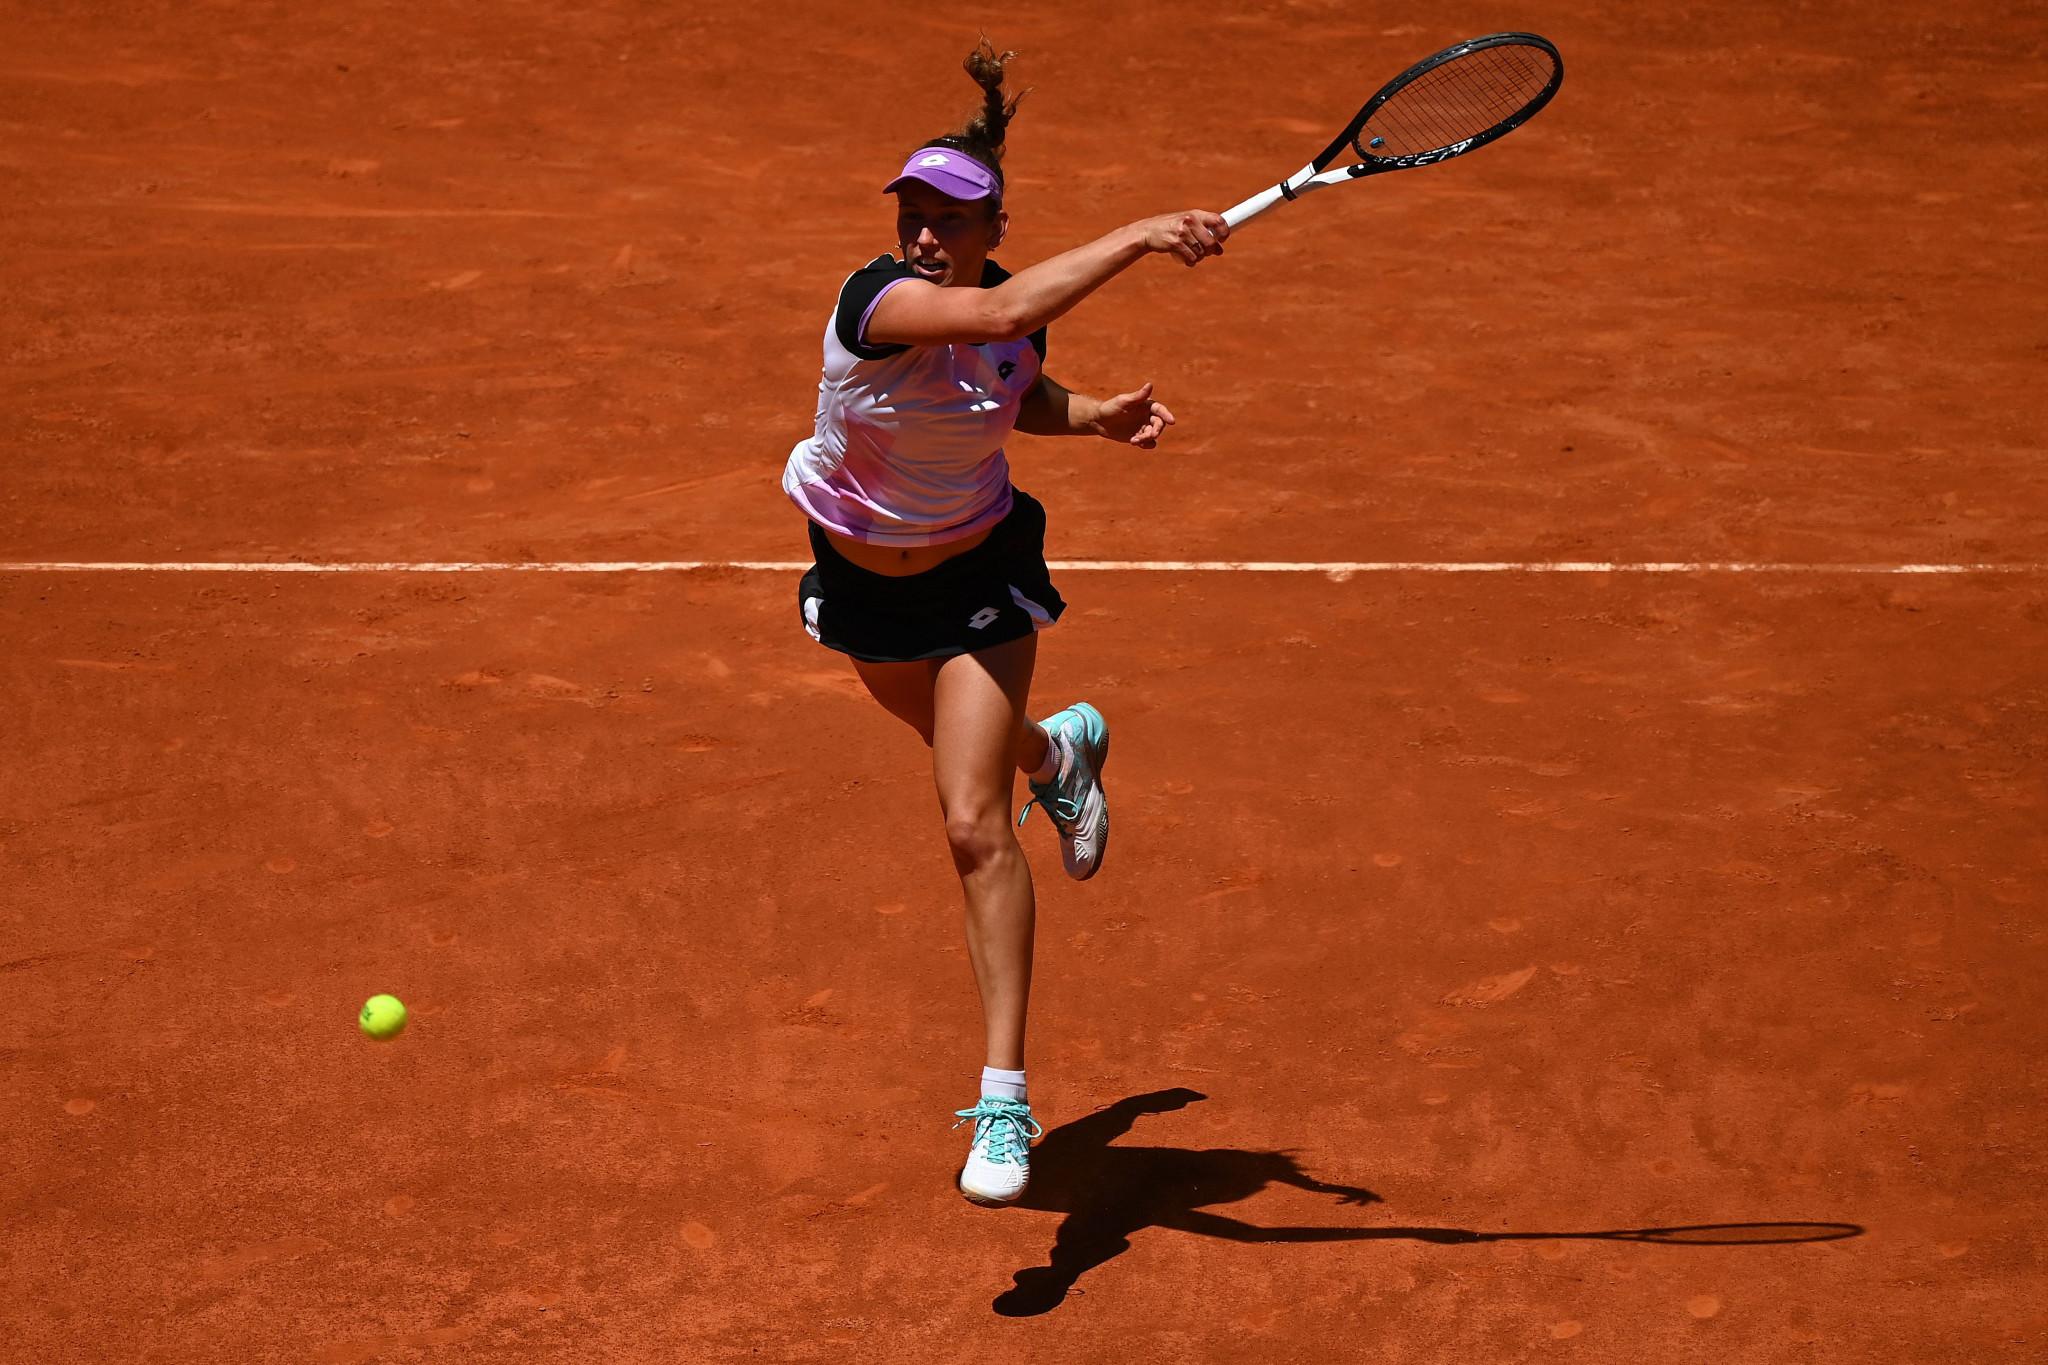 Belgium's Elise Mertens fought back to beat Simona Halep ©Getty Images